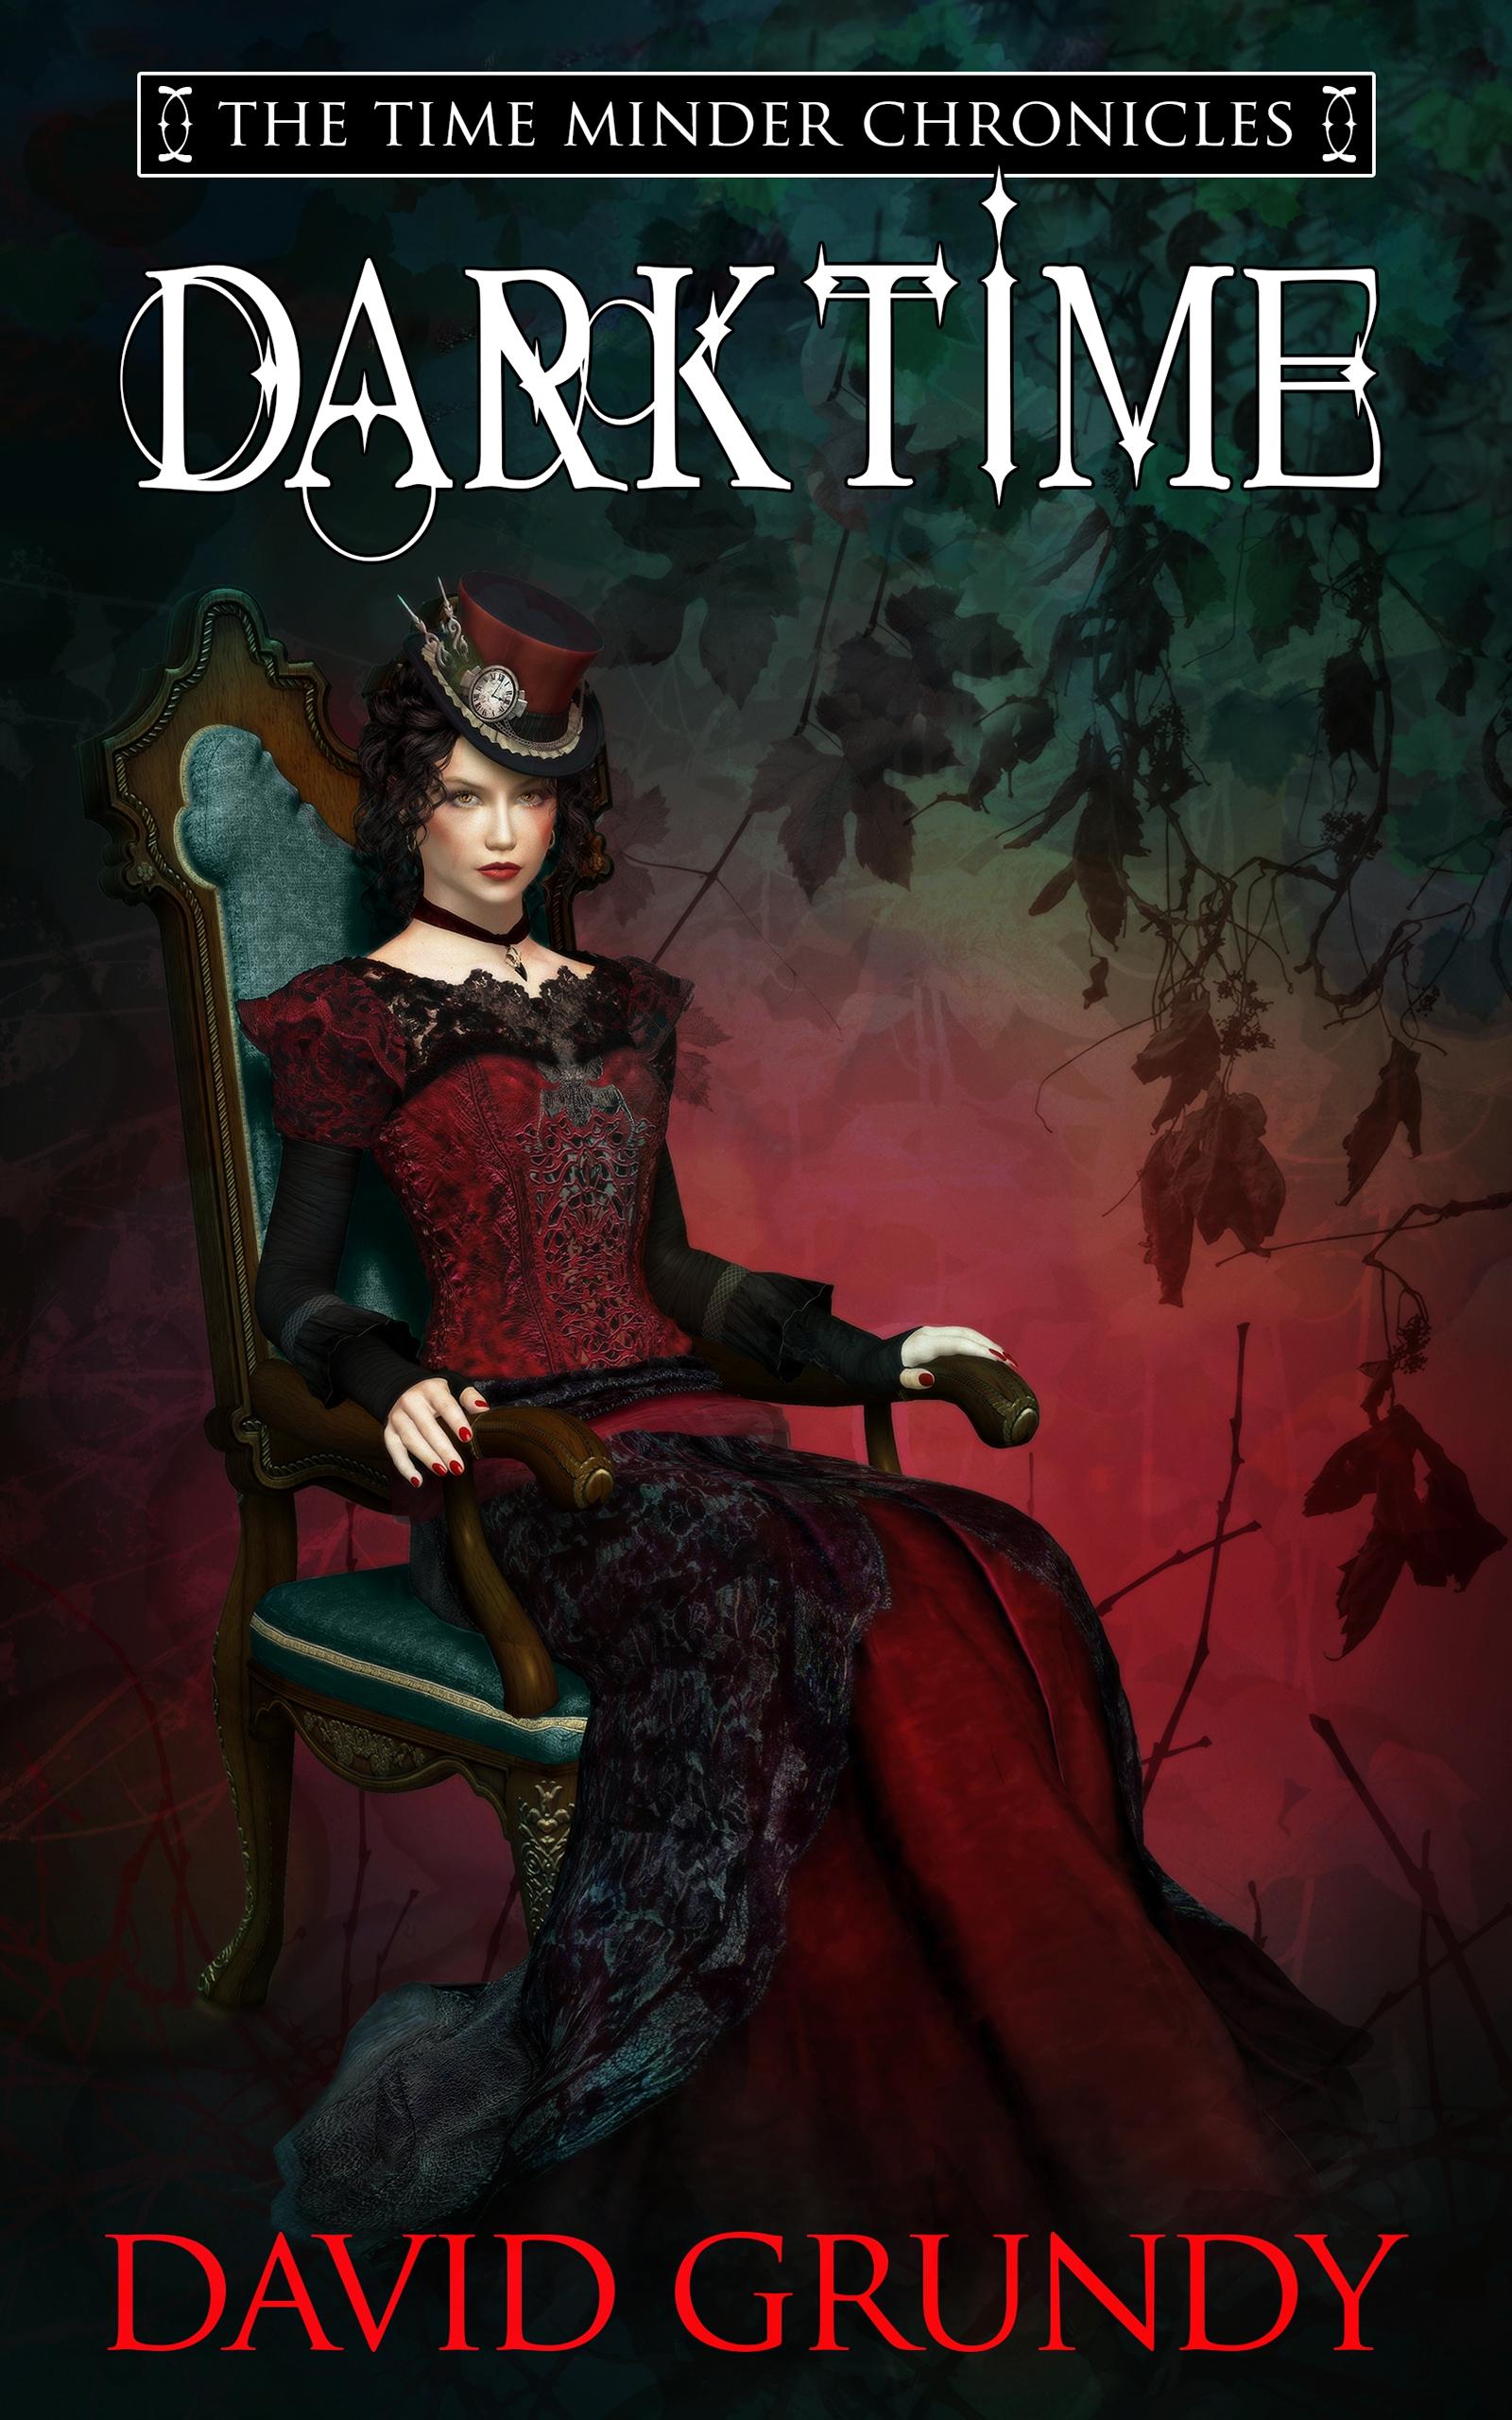 DarkTime book book cover design by Corvid Design